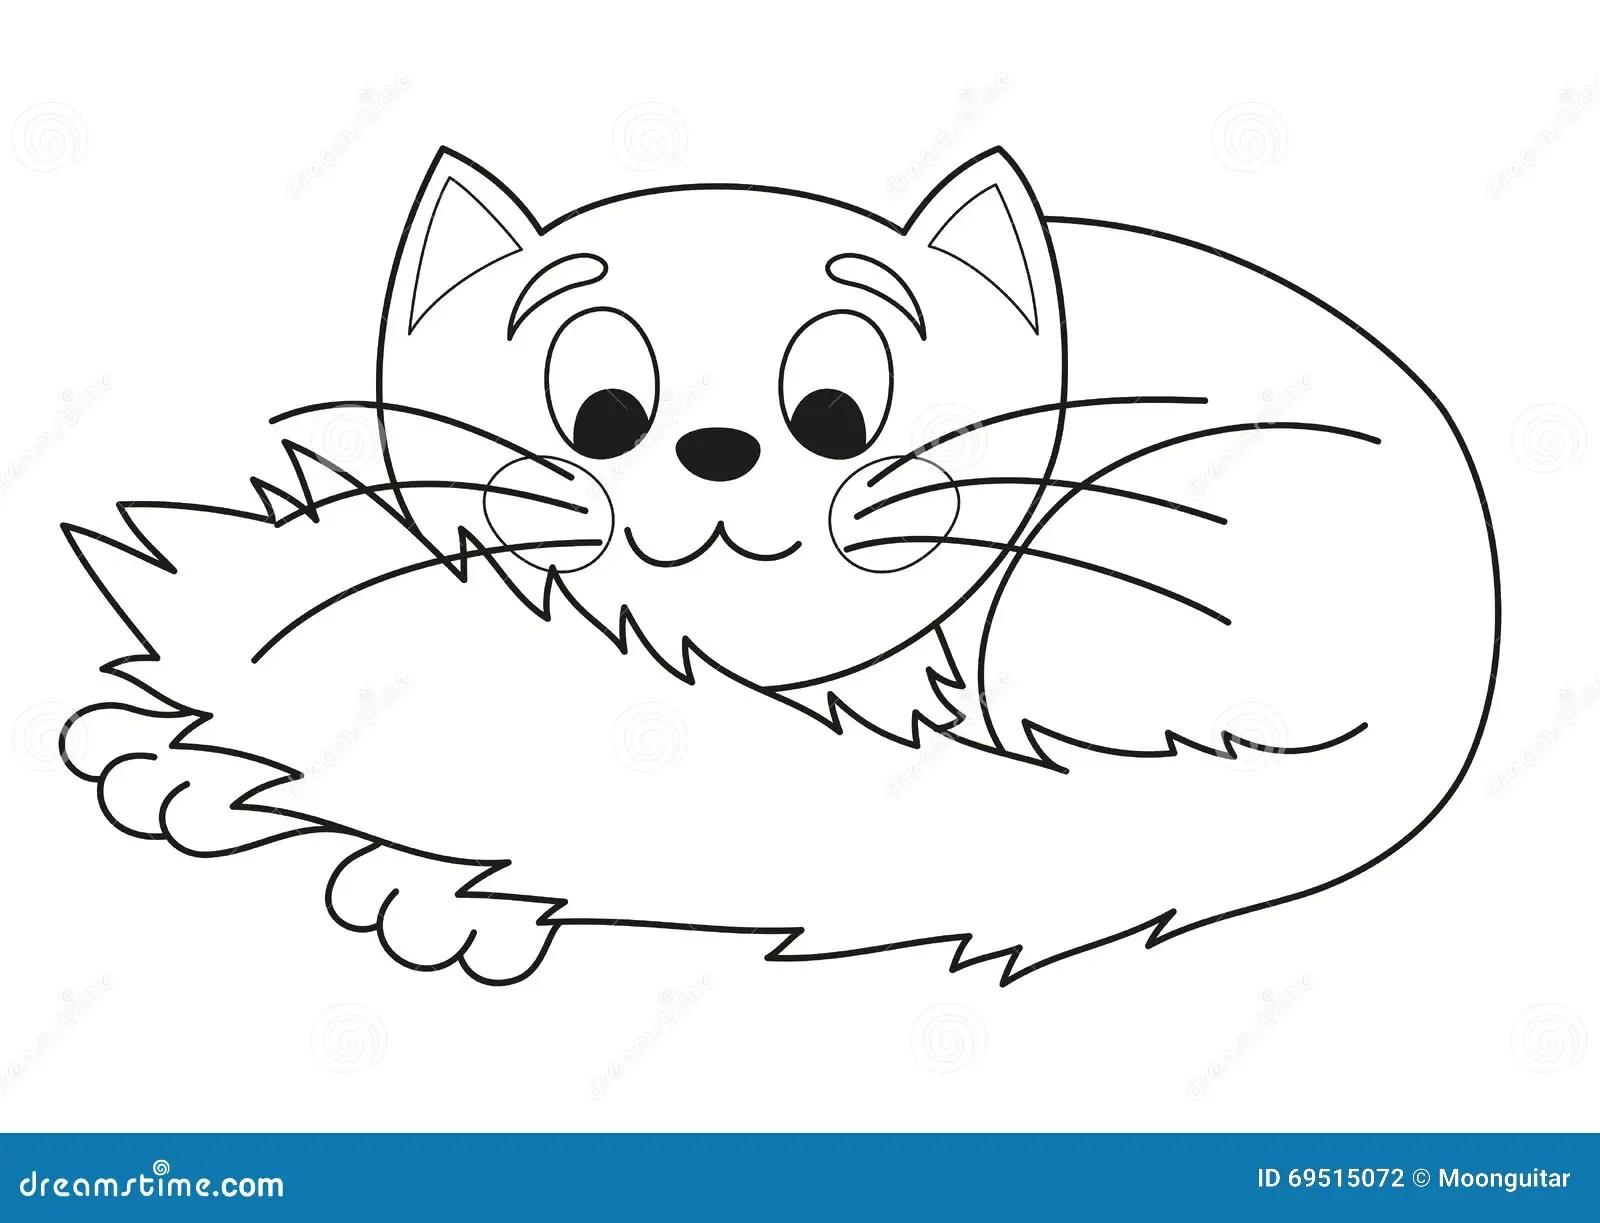 Cartoon Plump Kitty Vector Illustration Of Funny Cute Cat